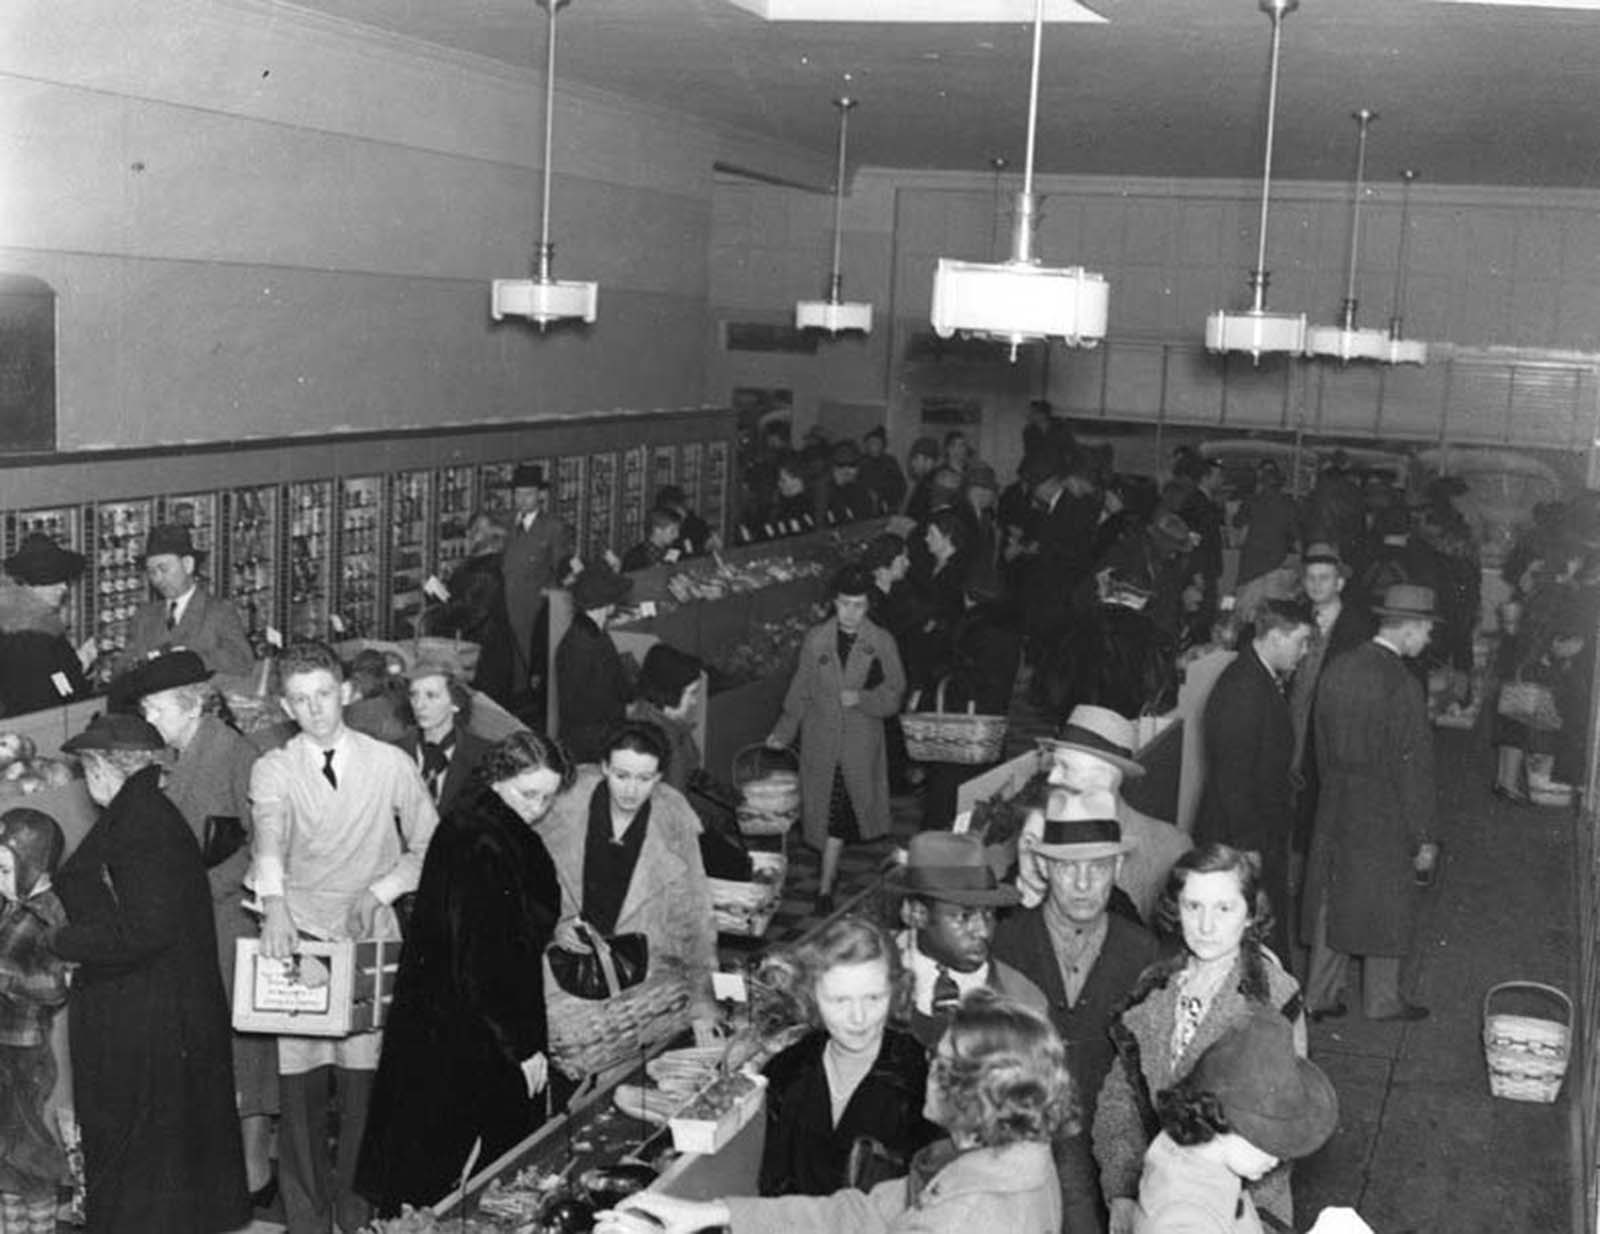 Shoppers inside Keedoozle. Memphis historian Michael Freeman writes,